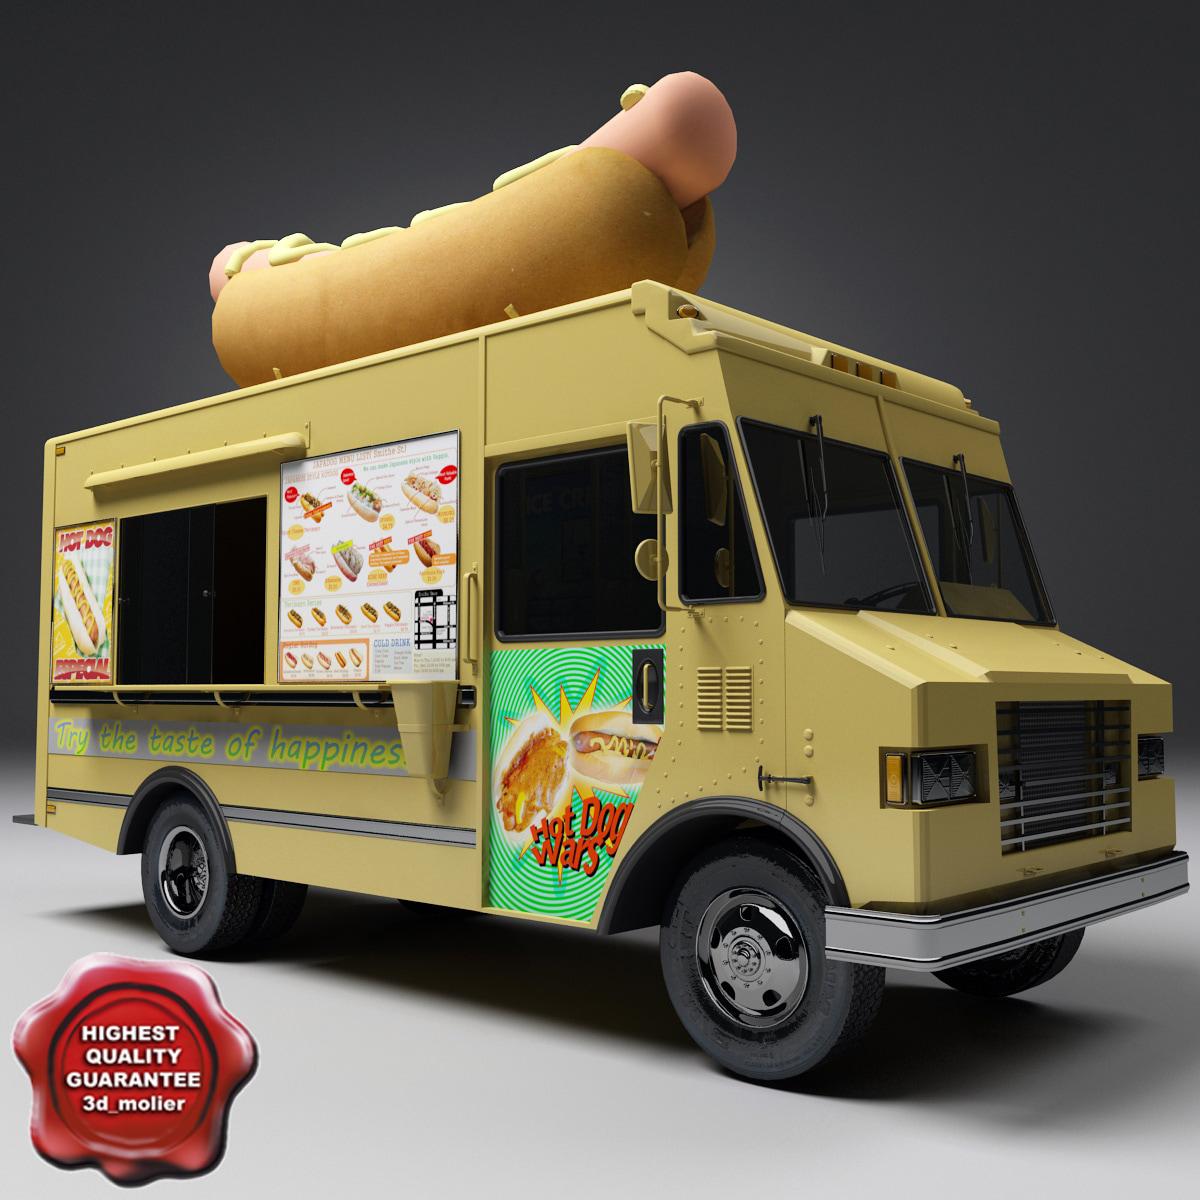 Hot_Dog_Truck_00.jpg